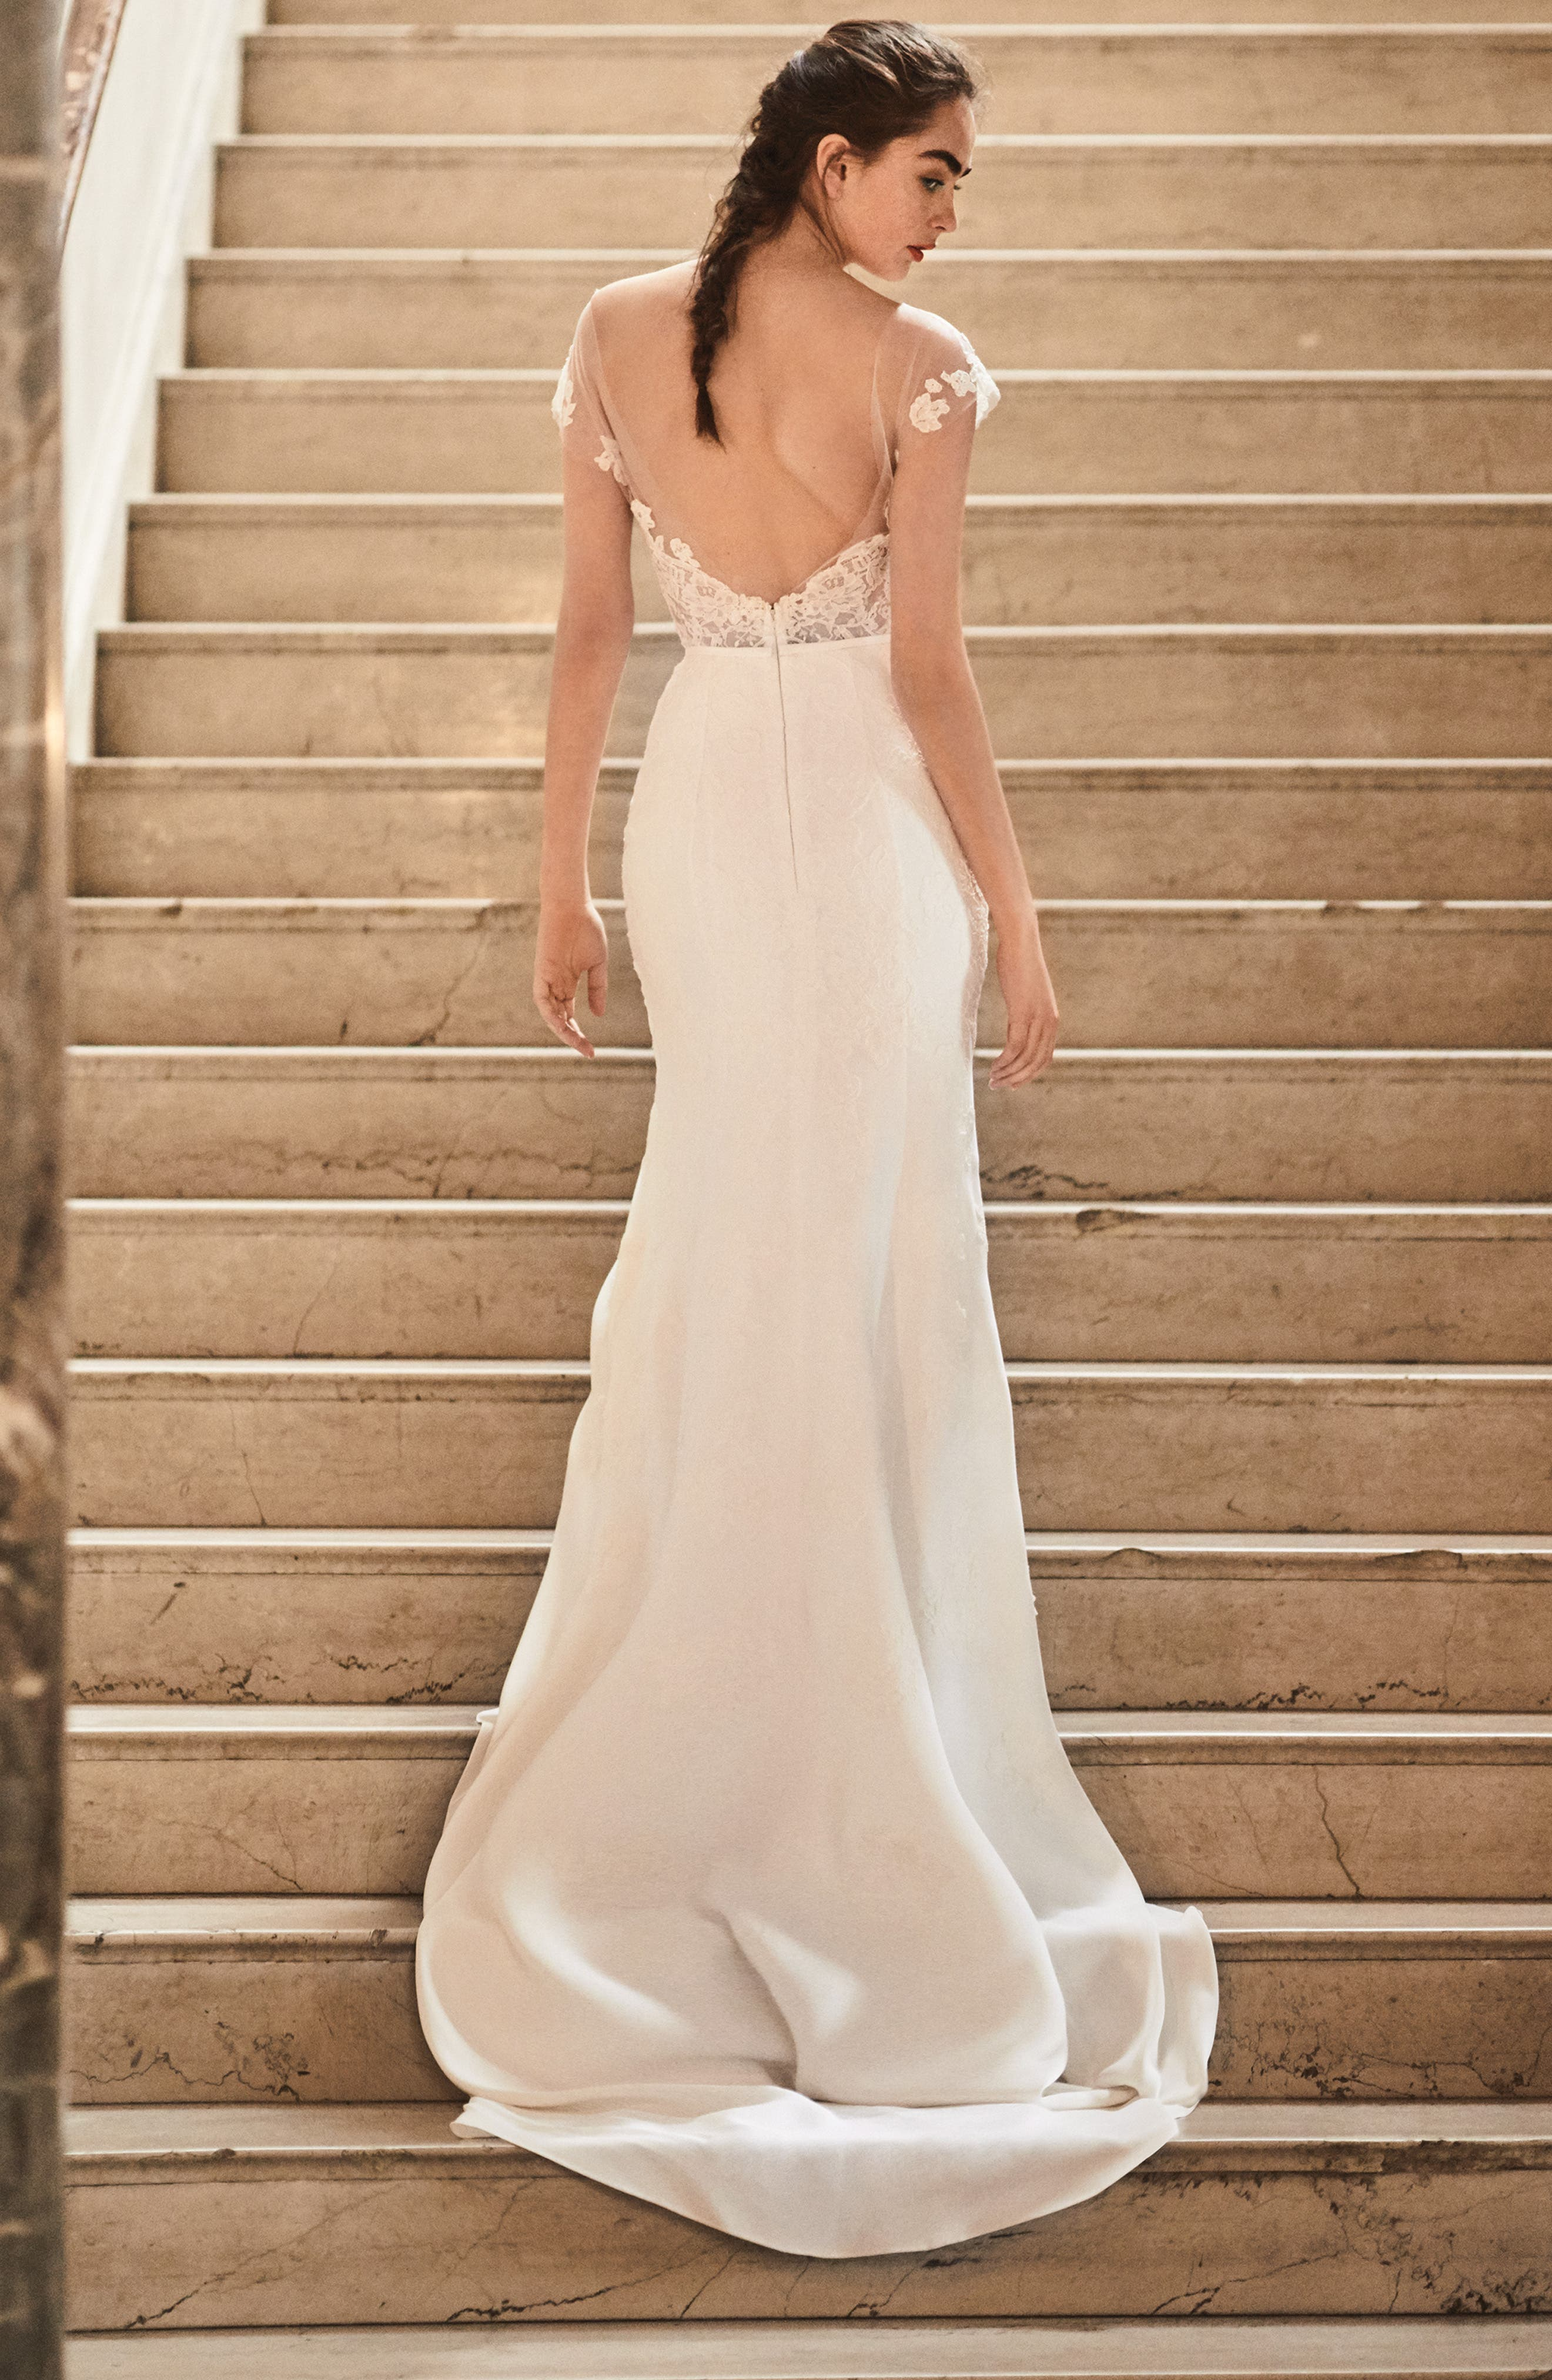 192b72bc2e Carolina Herrera Wedding Dresses   Bridal Gowns